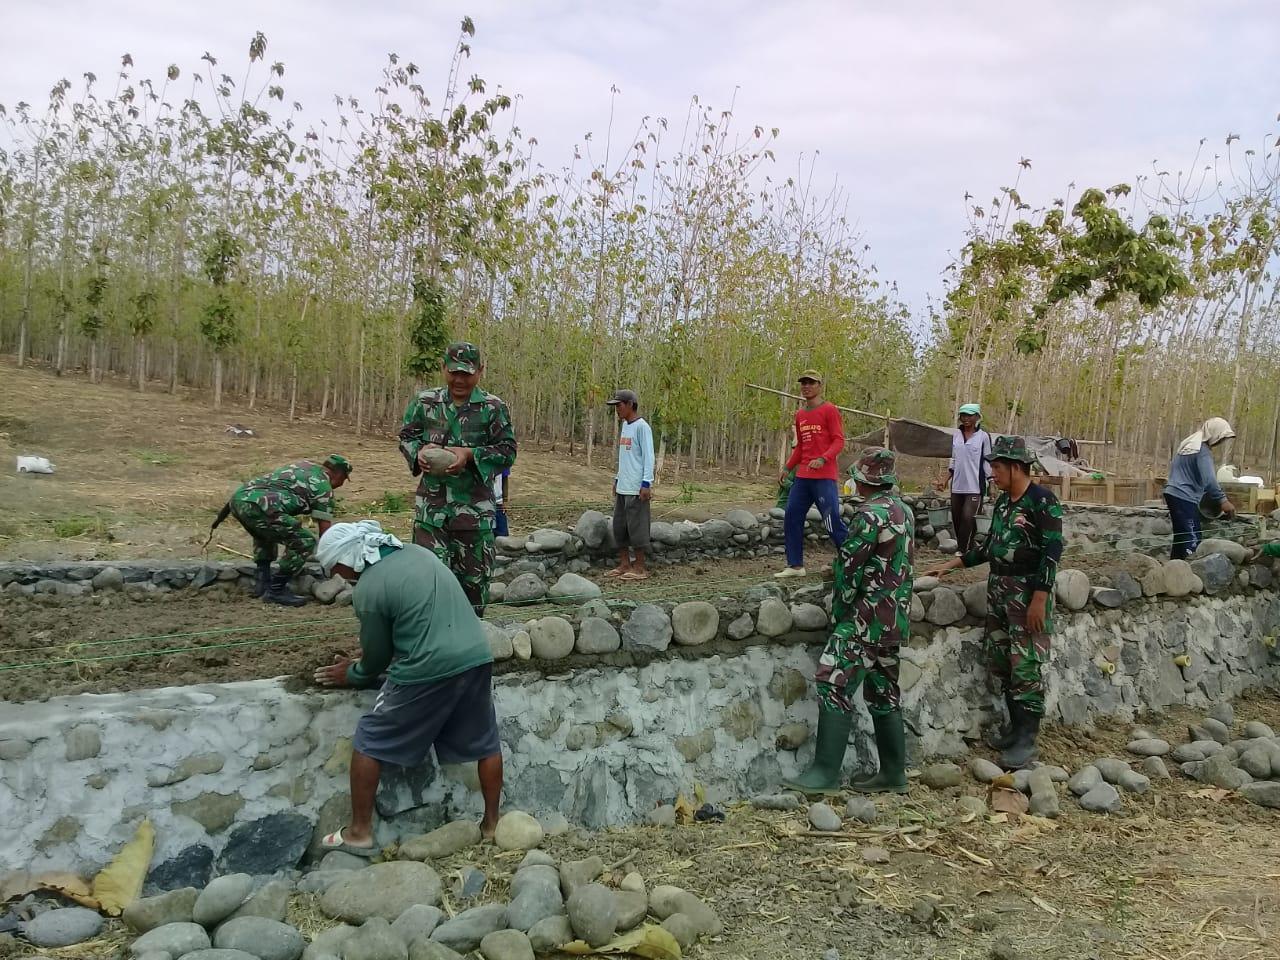 ANGGOTA TNI BERSAMA MASYARAKAT PERCEPAT PEMBUATAN  TALUD